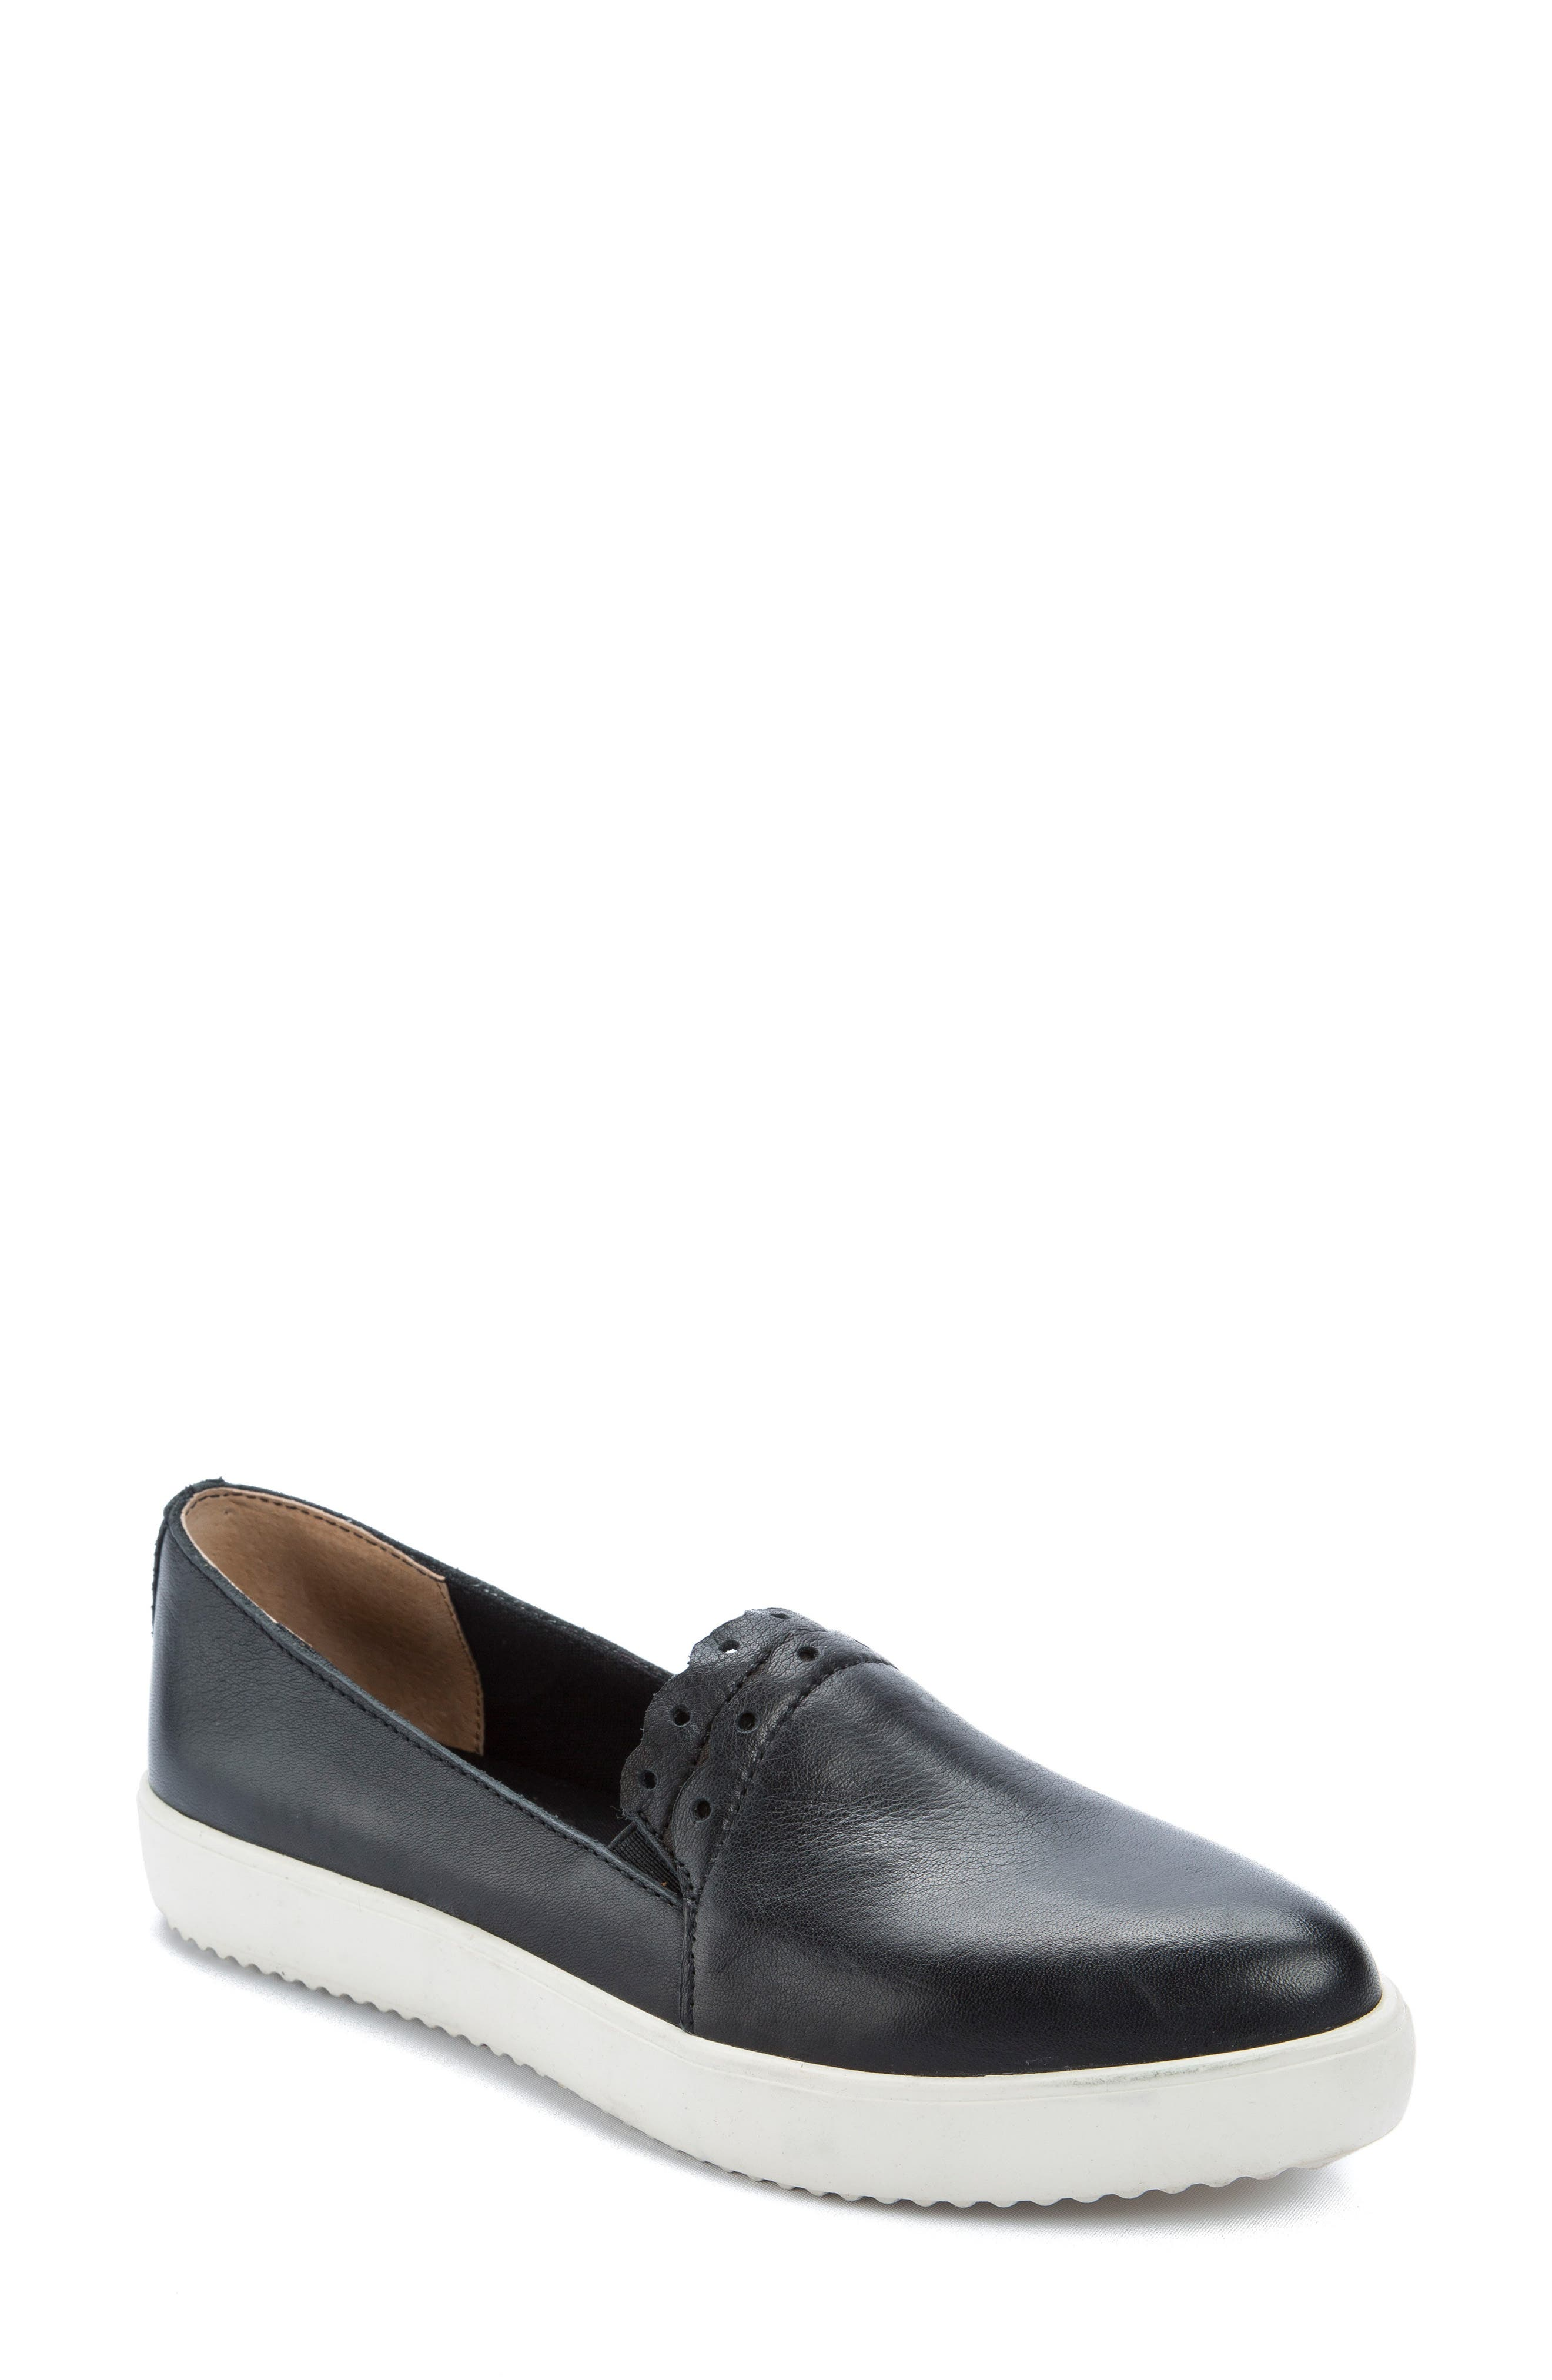 Roe Slip-On Sneaker,                             Main thumbnail 1, color,                             Black